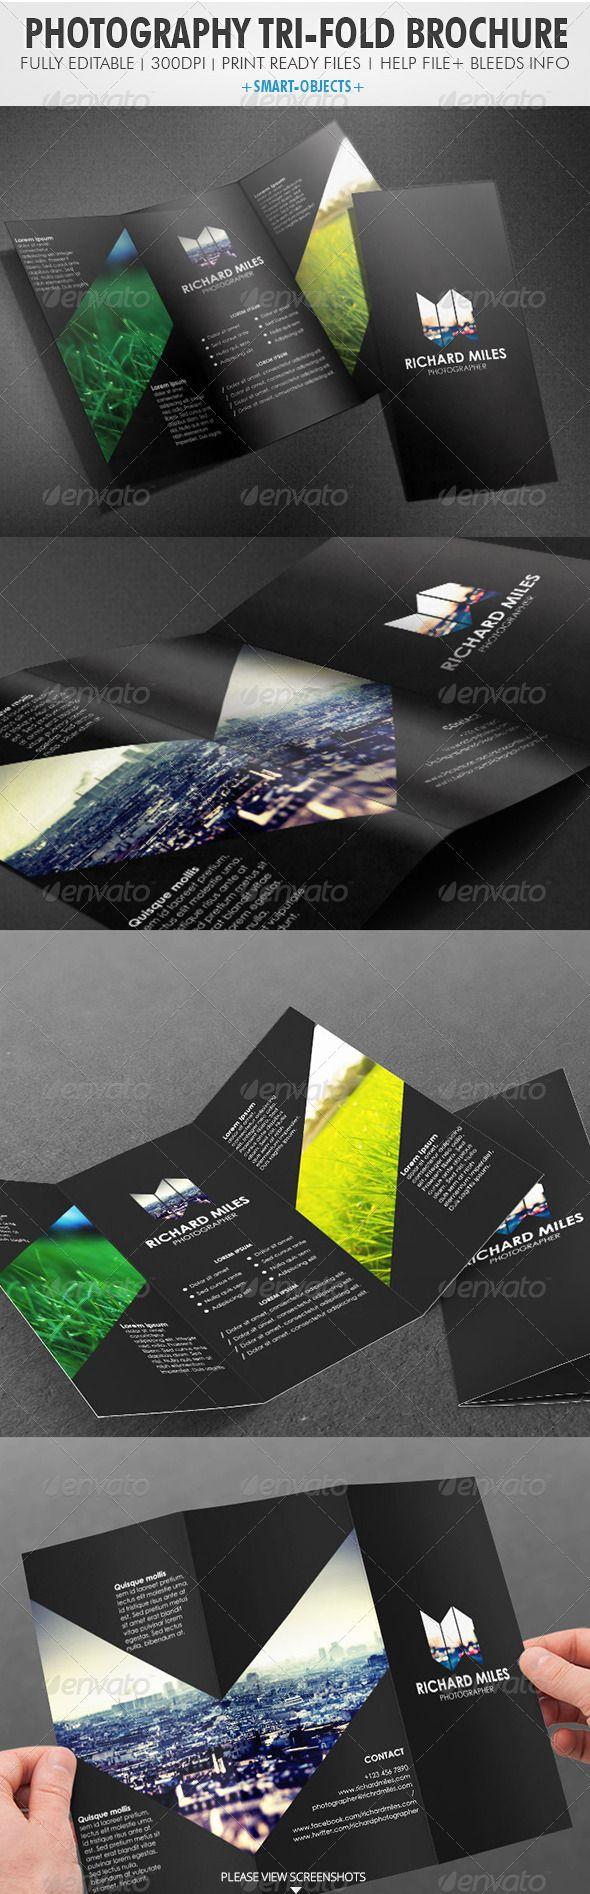 Photography Tri-fold Brochure http://graphicriver.net/item/photography-trifold-brochure/4027623?WT.ac=portfolio_1=portfolio_author=Realstar